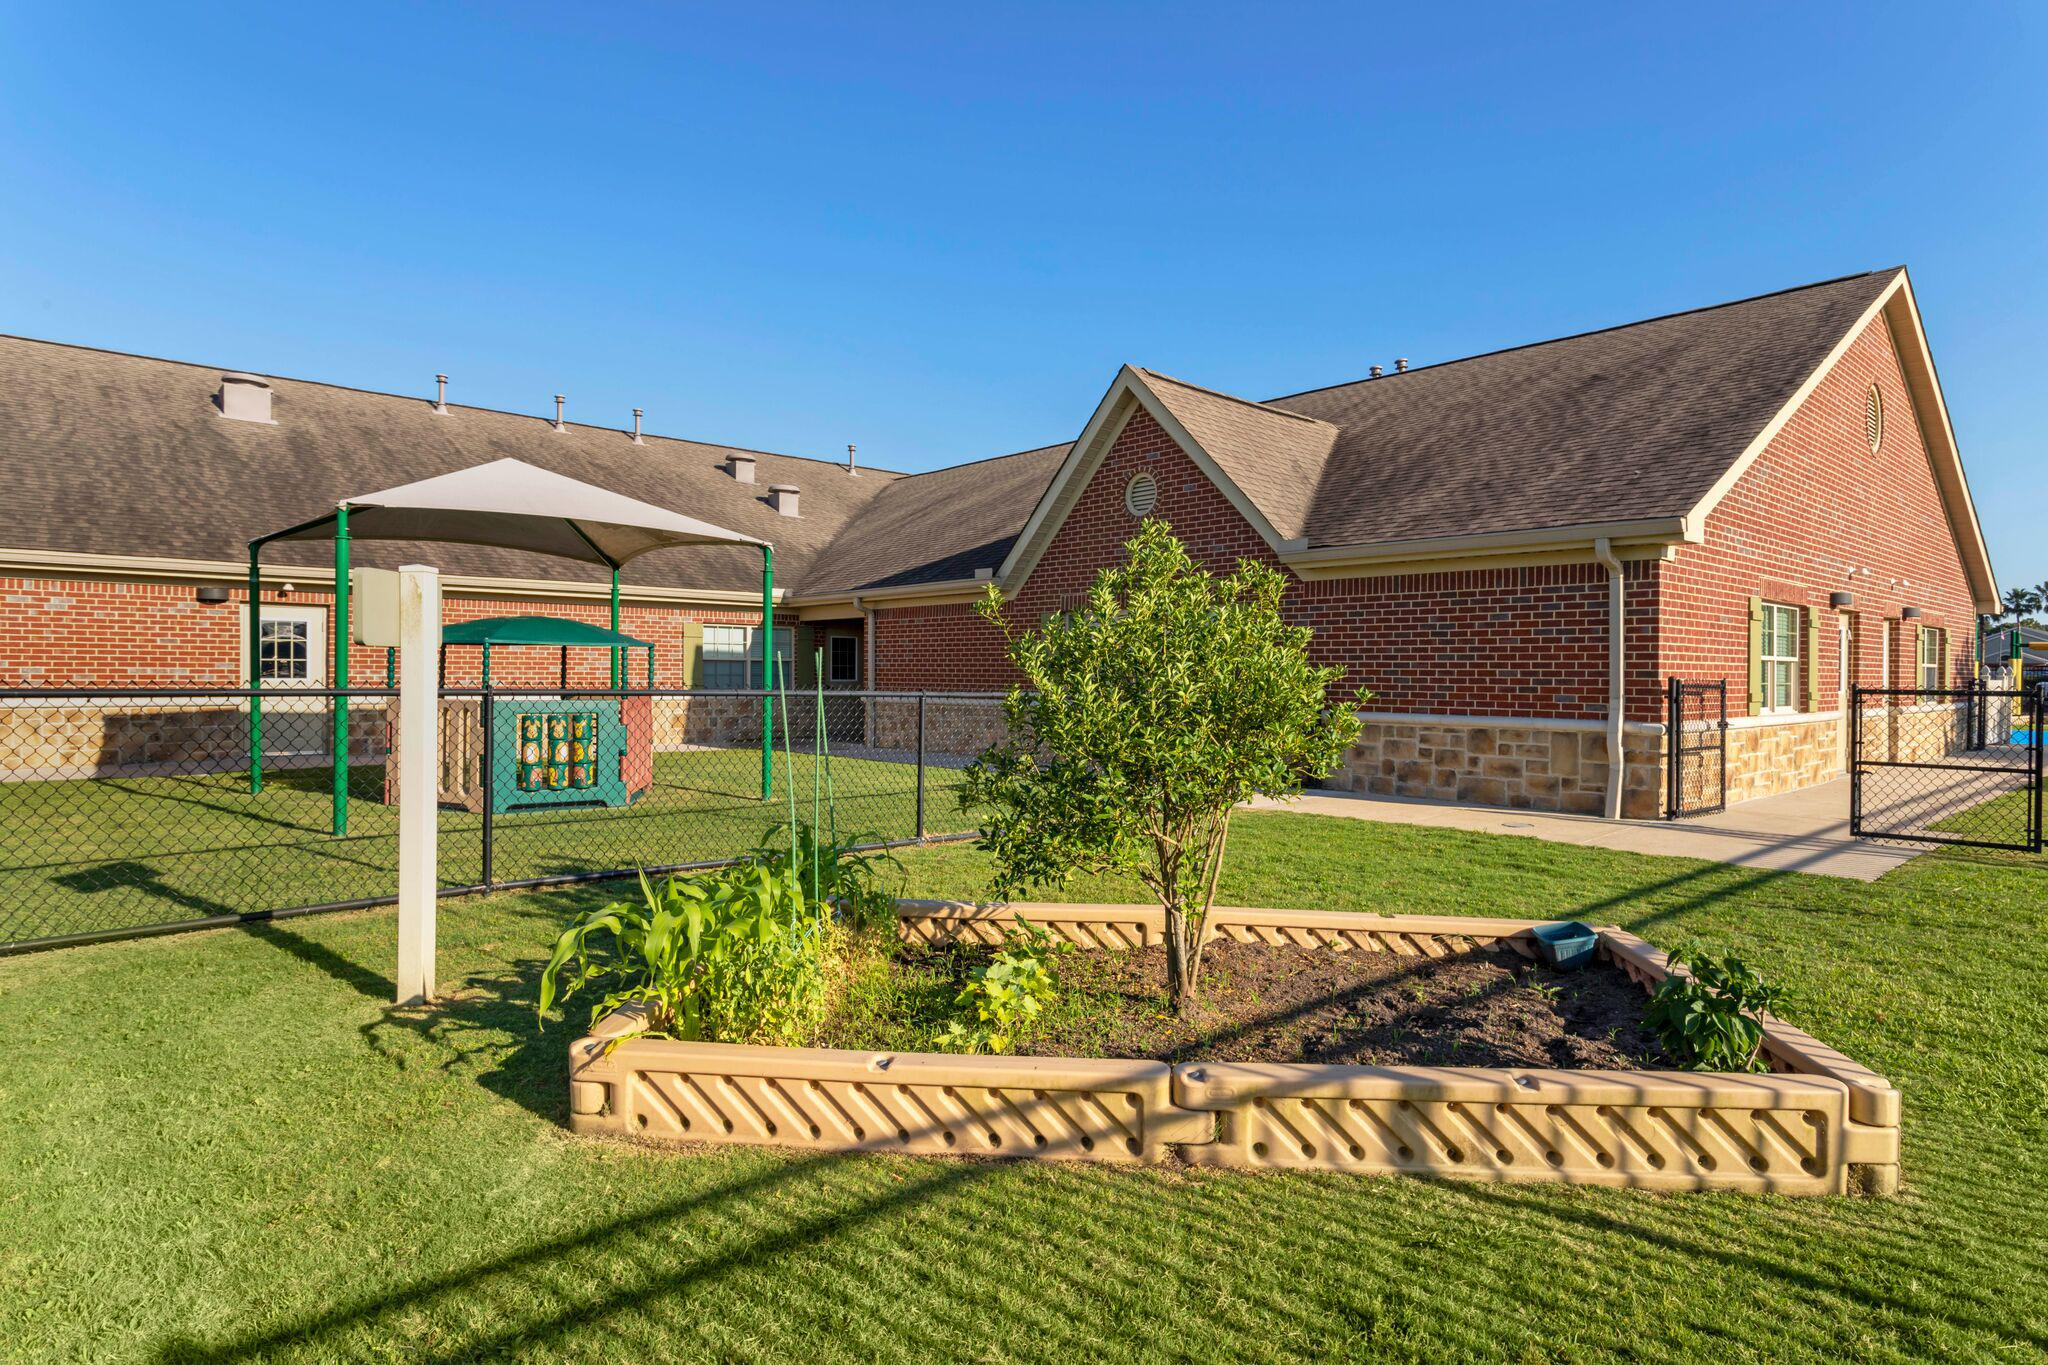 Primrose School of Clear Lake